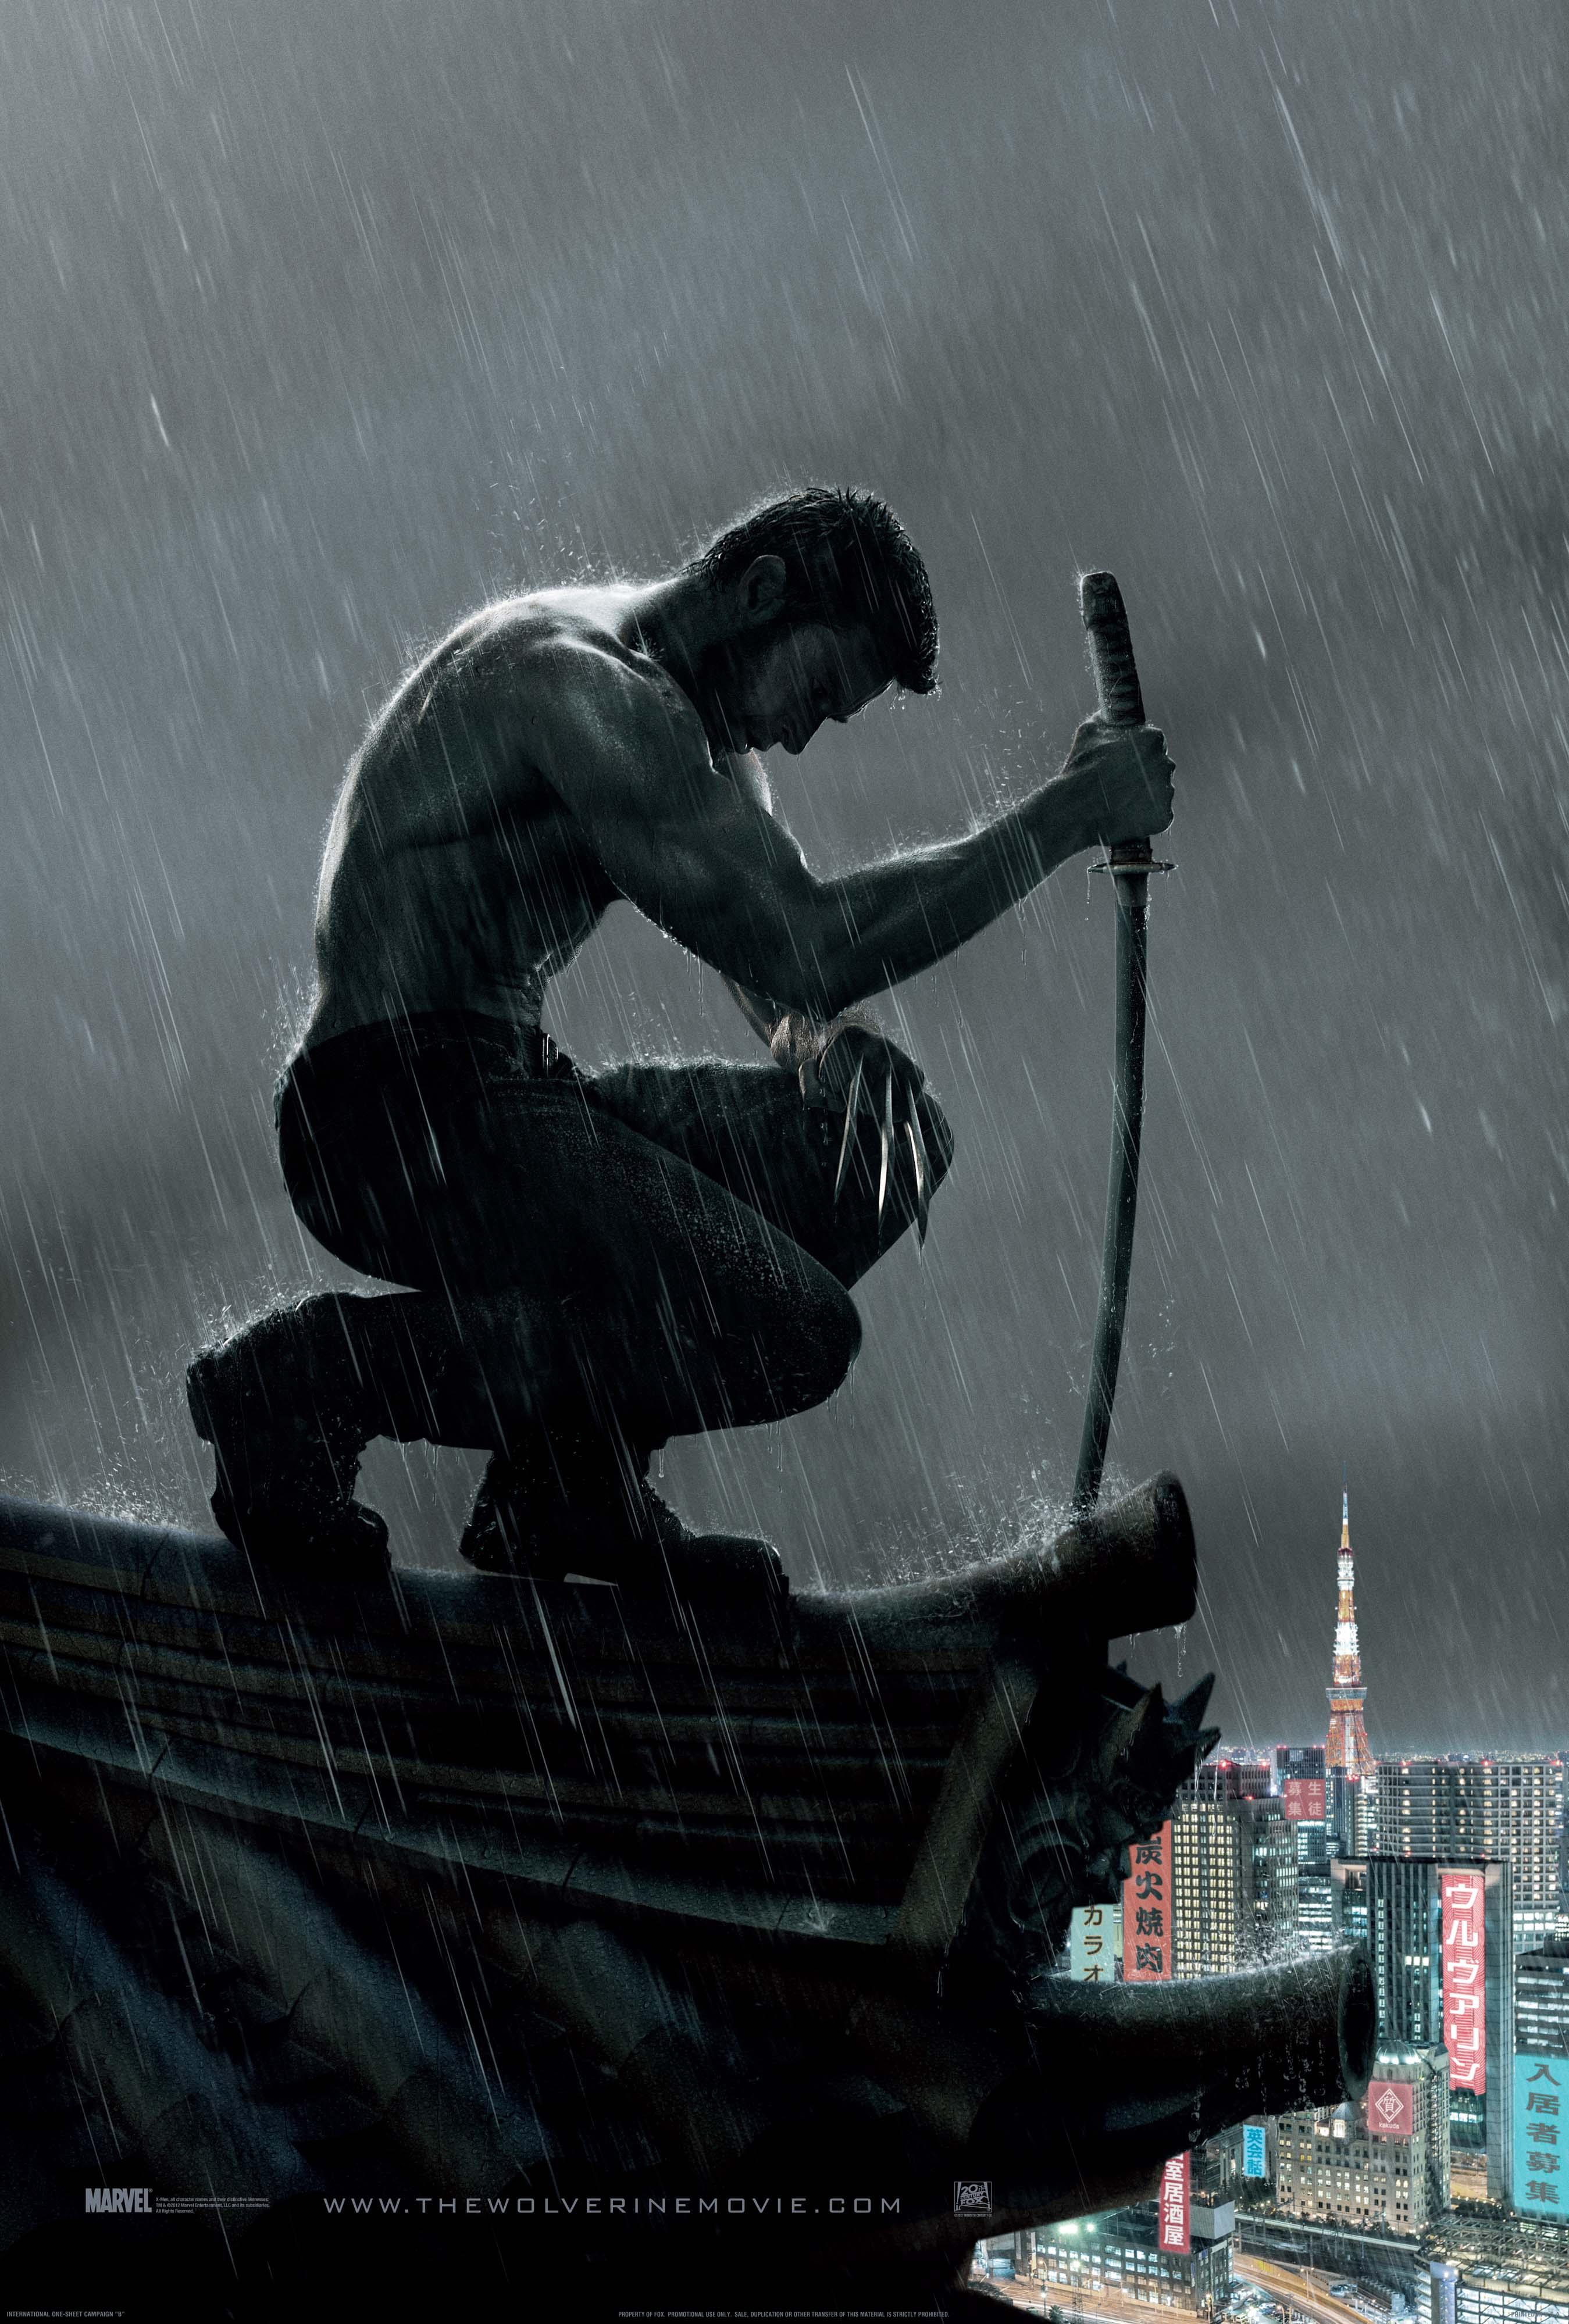 The Wolverine - Movie Poster #4 (Original)